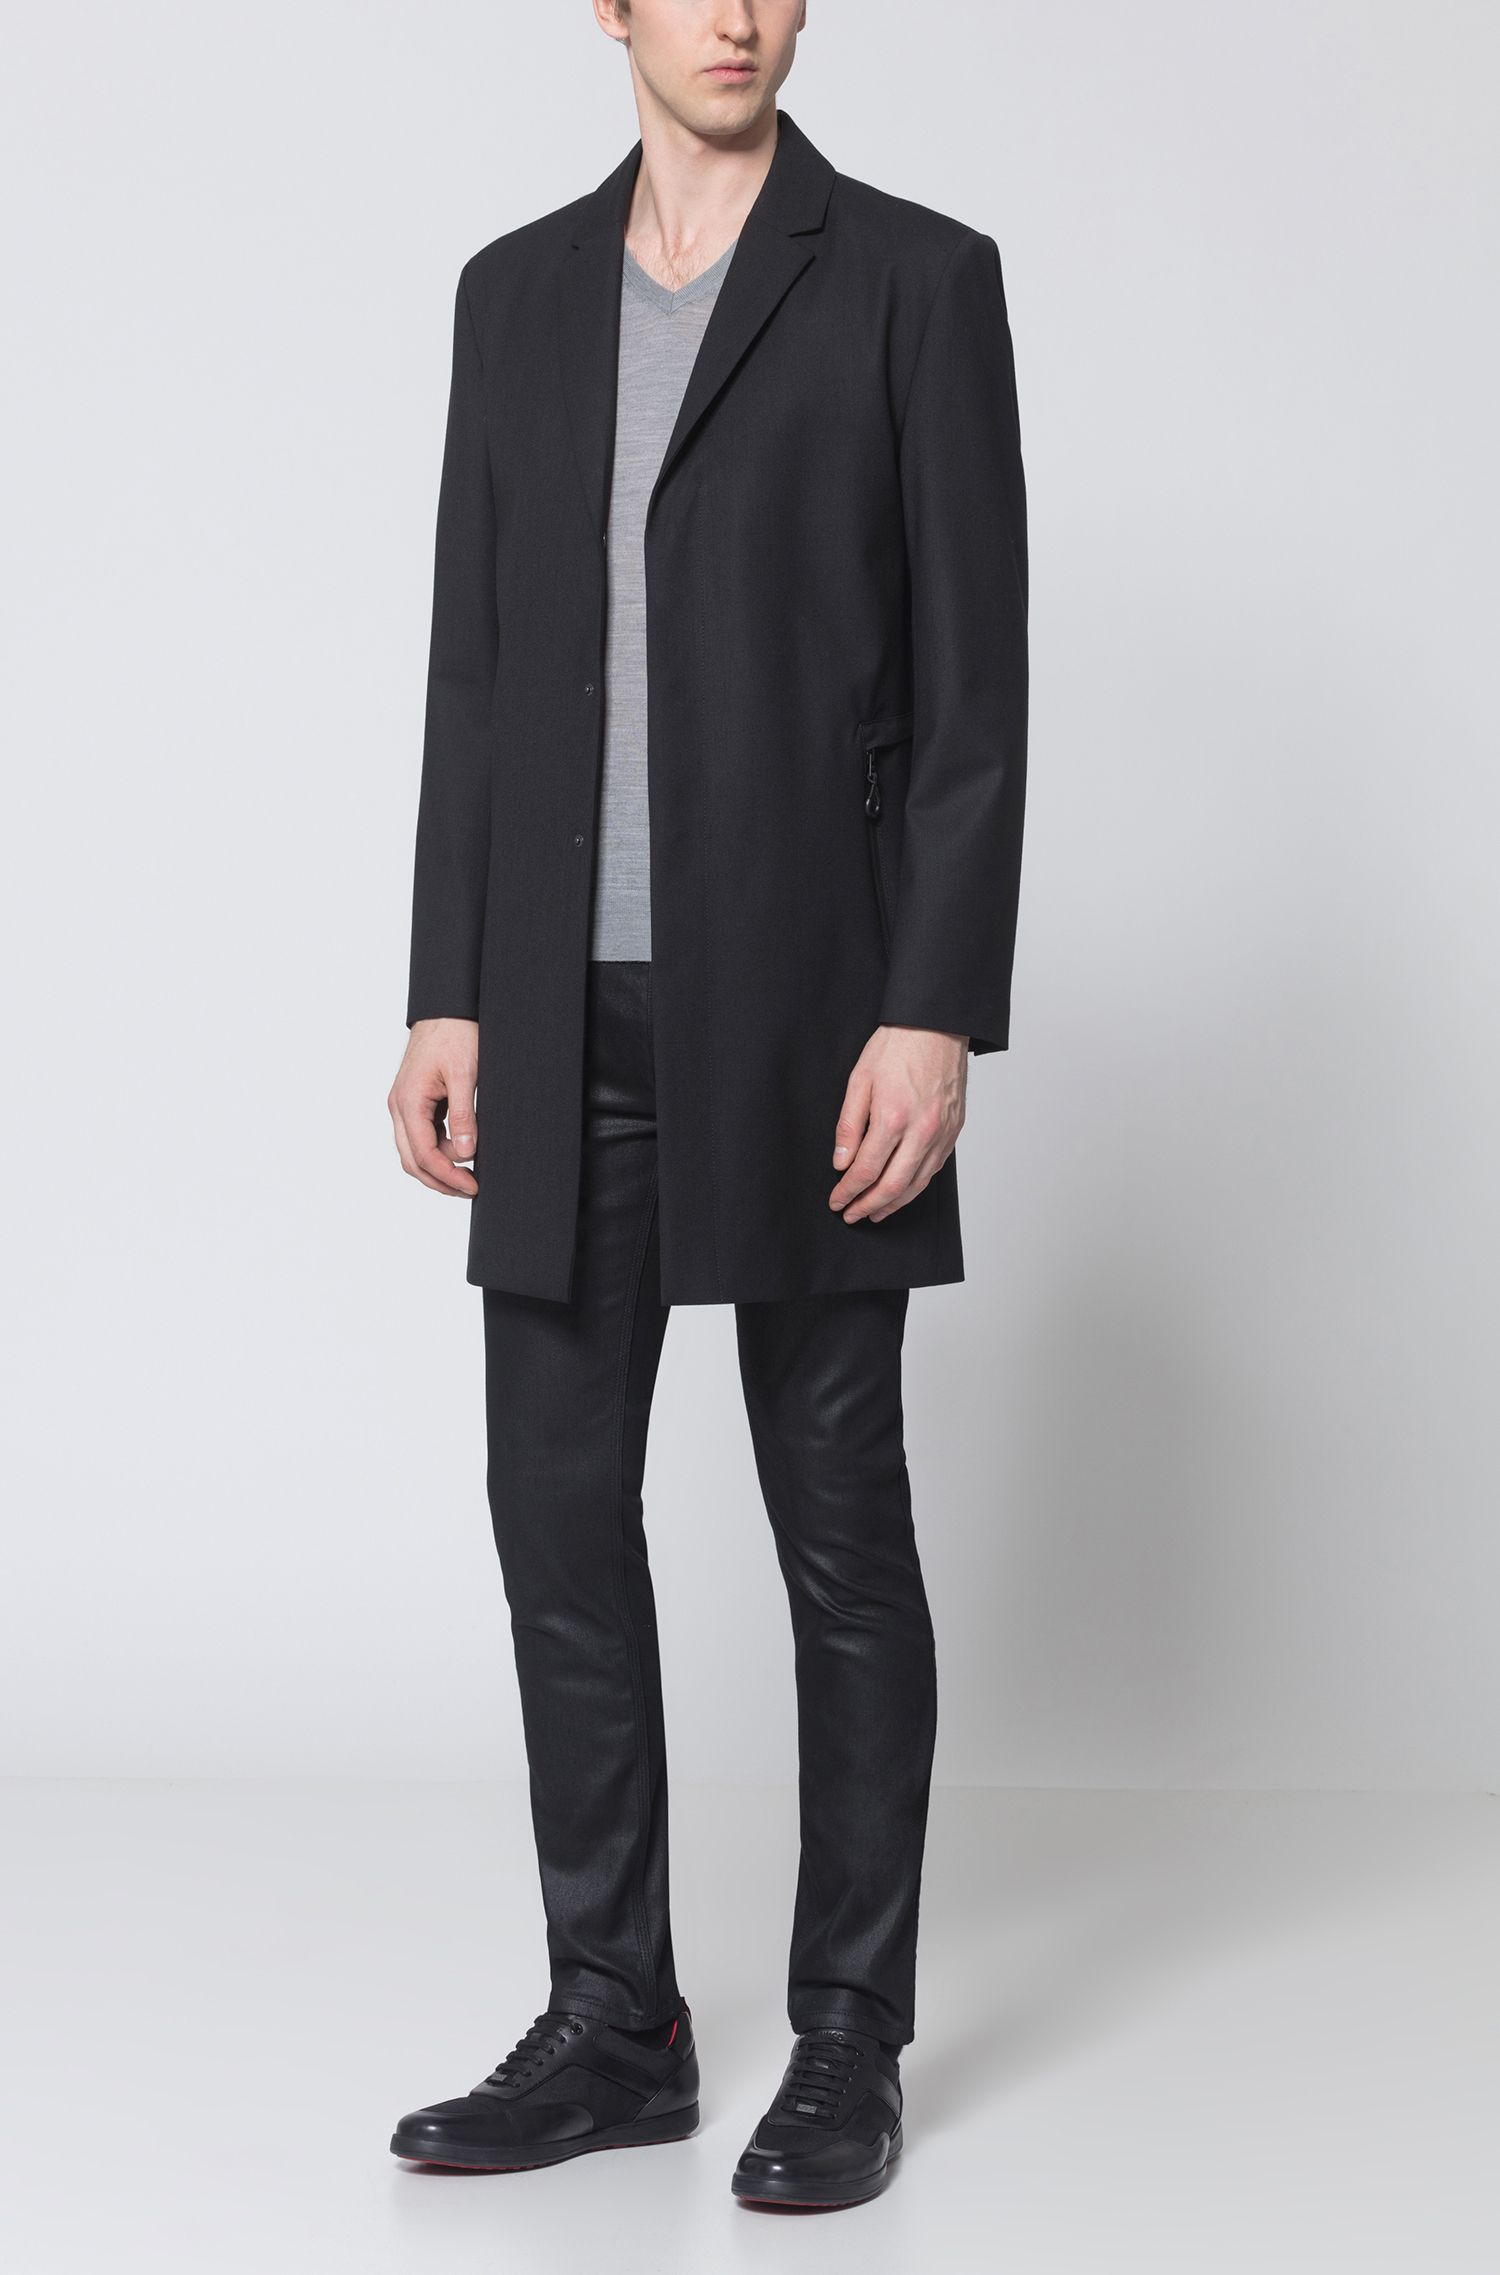 Lightweight V-neck sweater in a merino wool blend